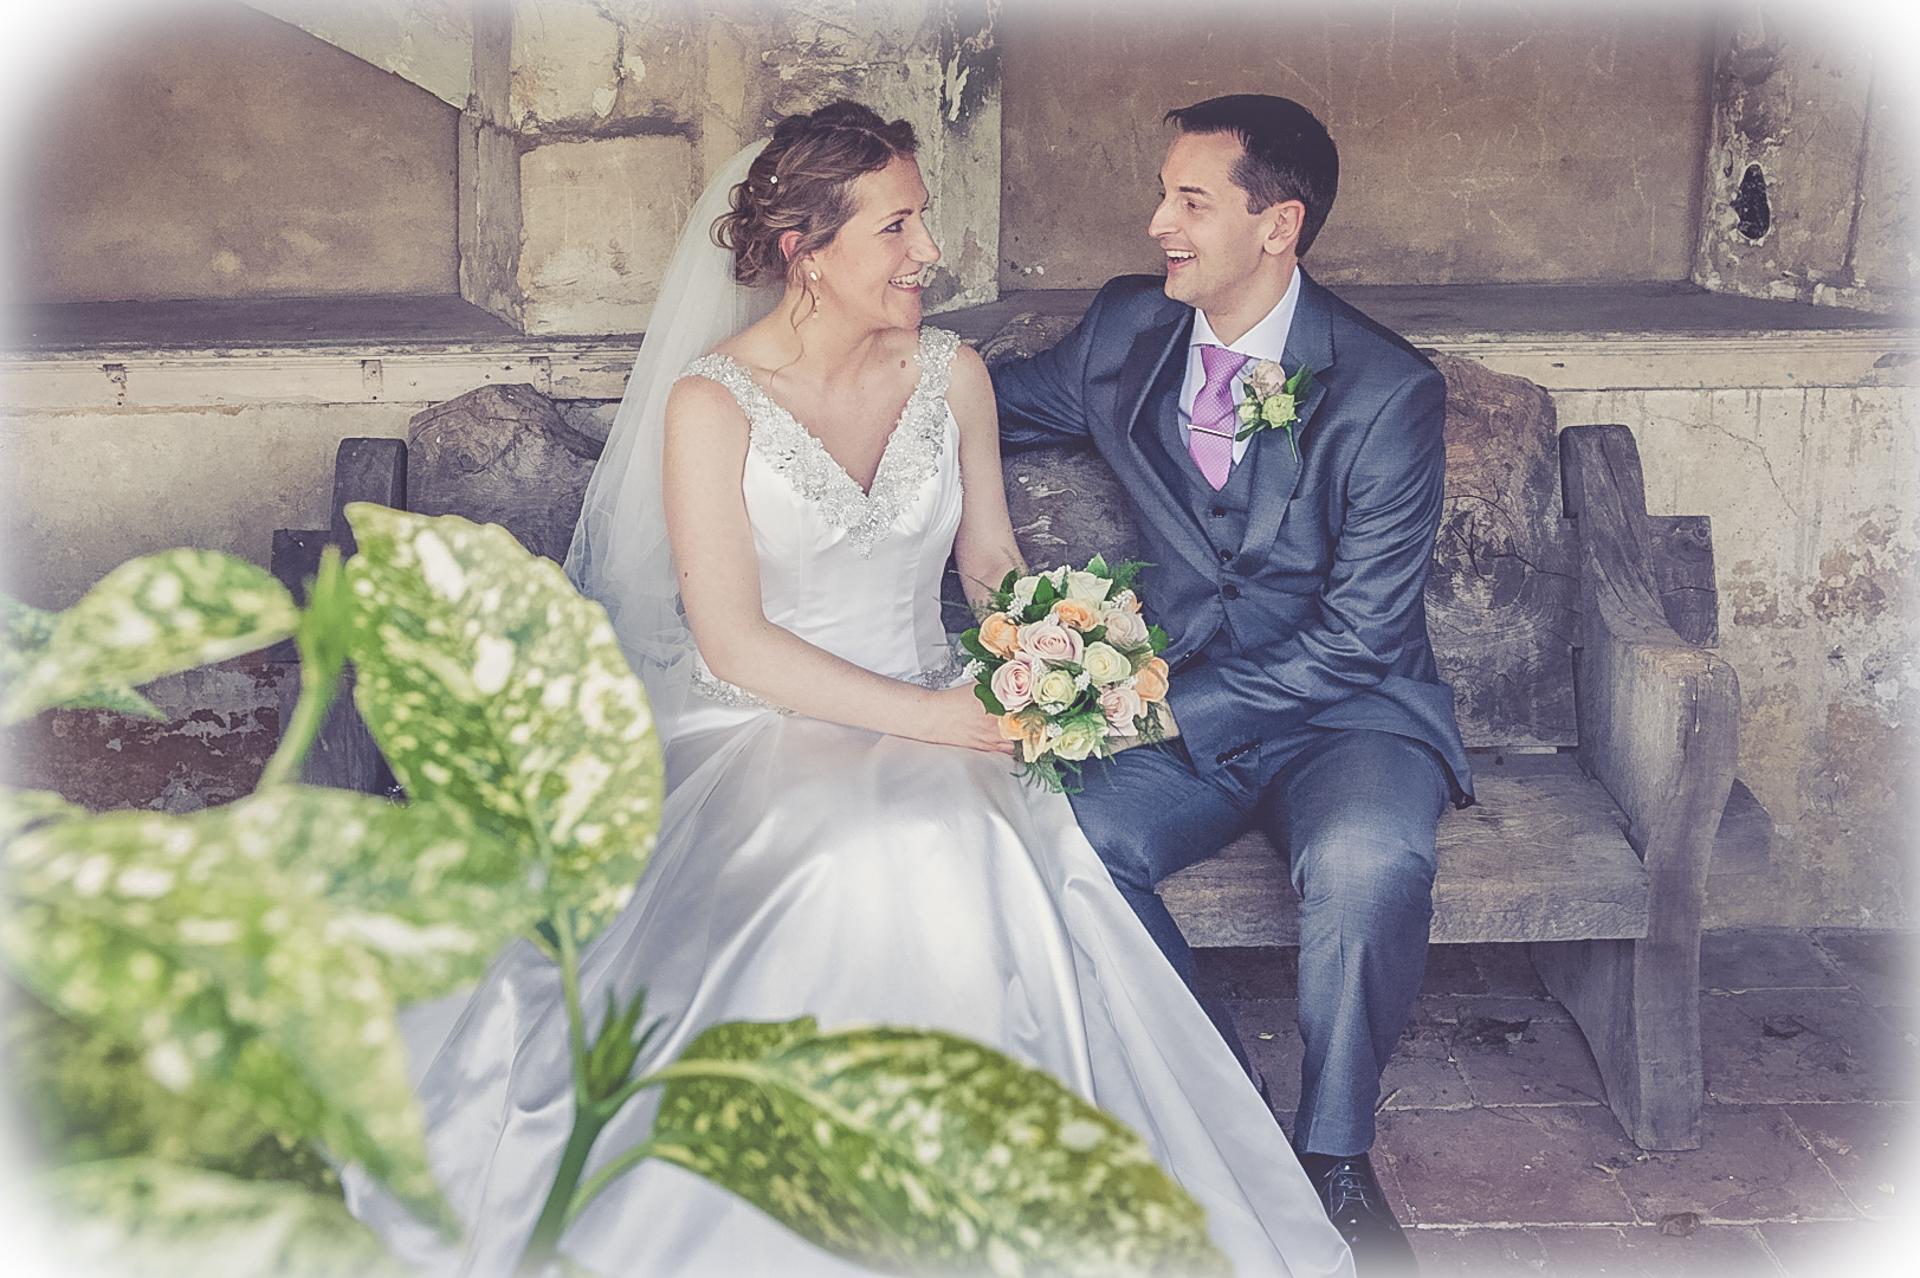 bisham-abbey-wedding_10-2.JPG